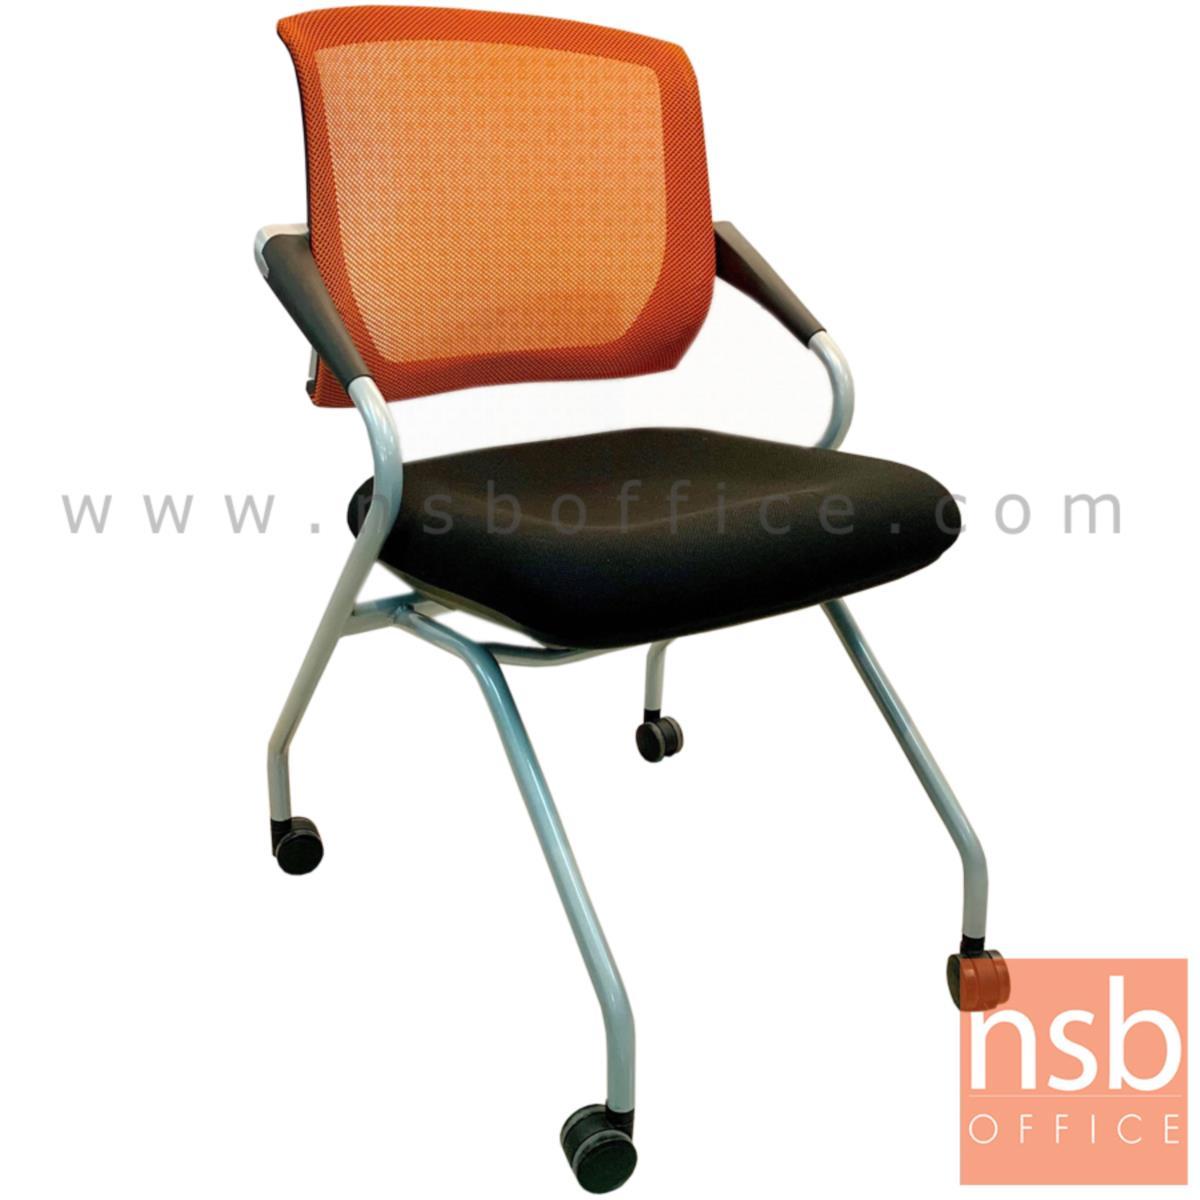 B05A096:เก้าอี้สำนักงานหลังเน็ต รุ่น Fletcher (เฟล็ตเชอร์)  ขาเหล็กพ่นสีเทาเมทัลลิค